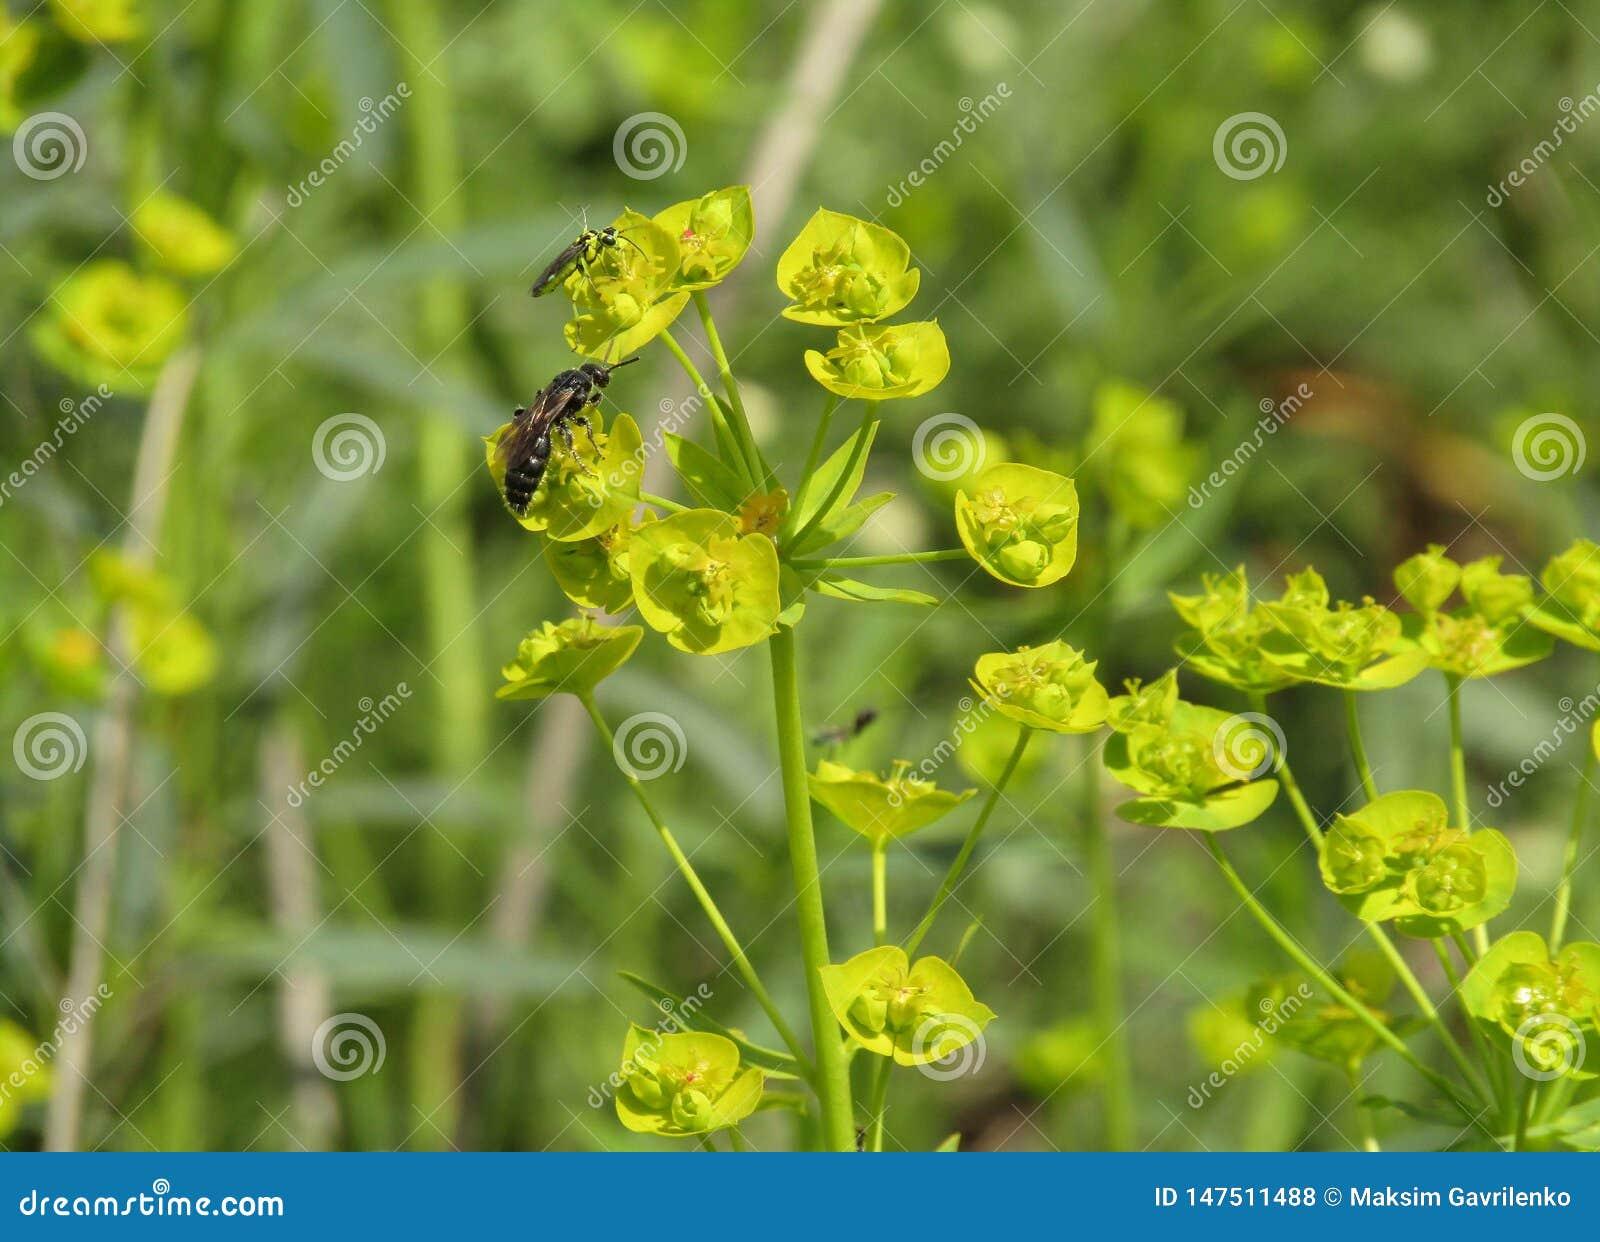 Plant euphorbia cyparissias